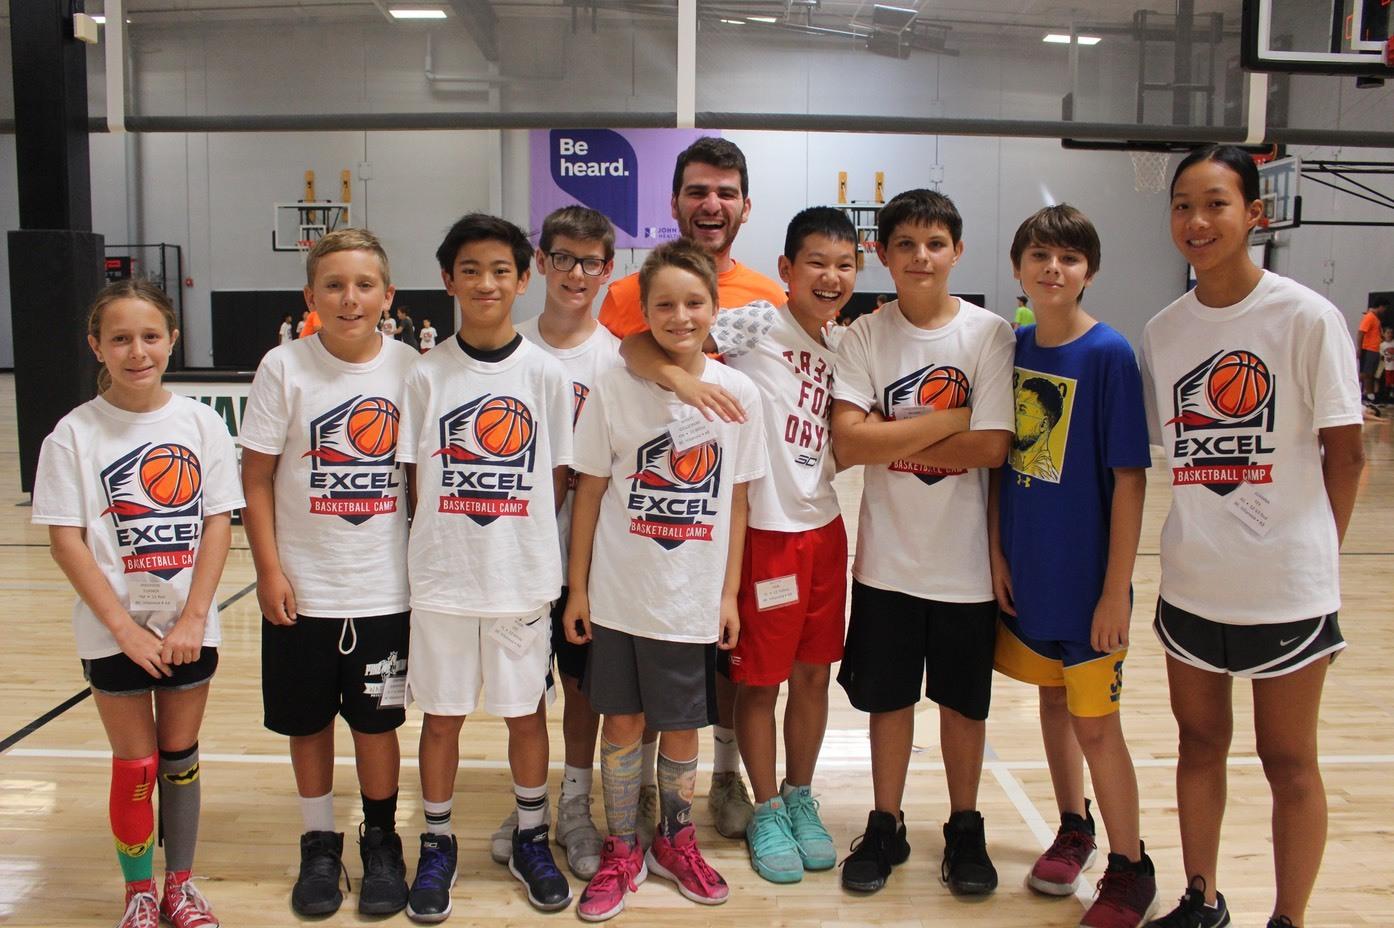 excel basketball camp schedule reviews activityhero